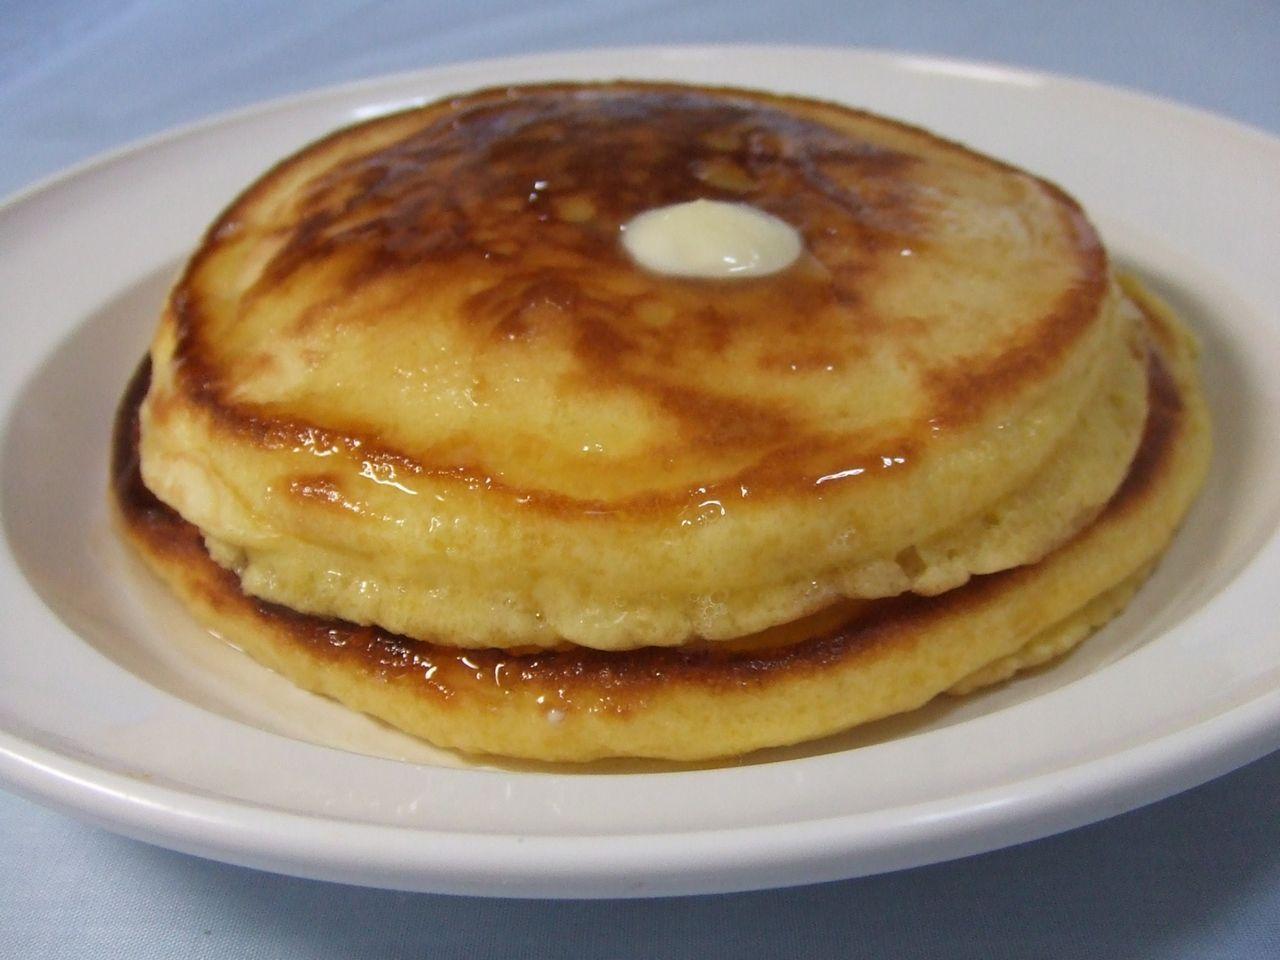 Hot Cake Recipe Without Egg